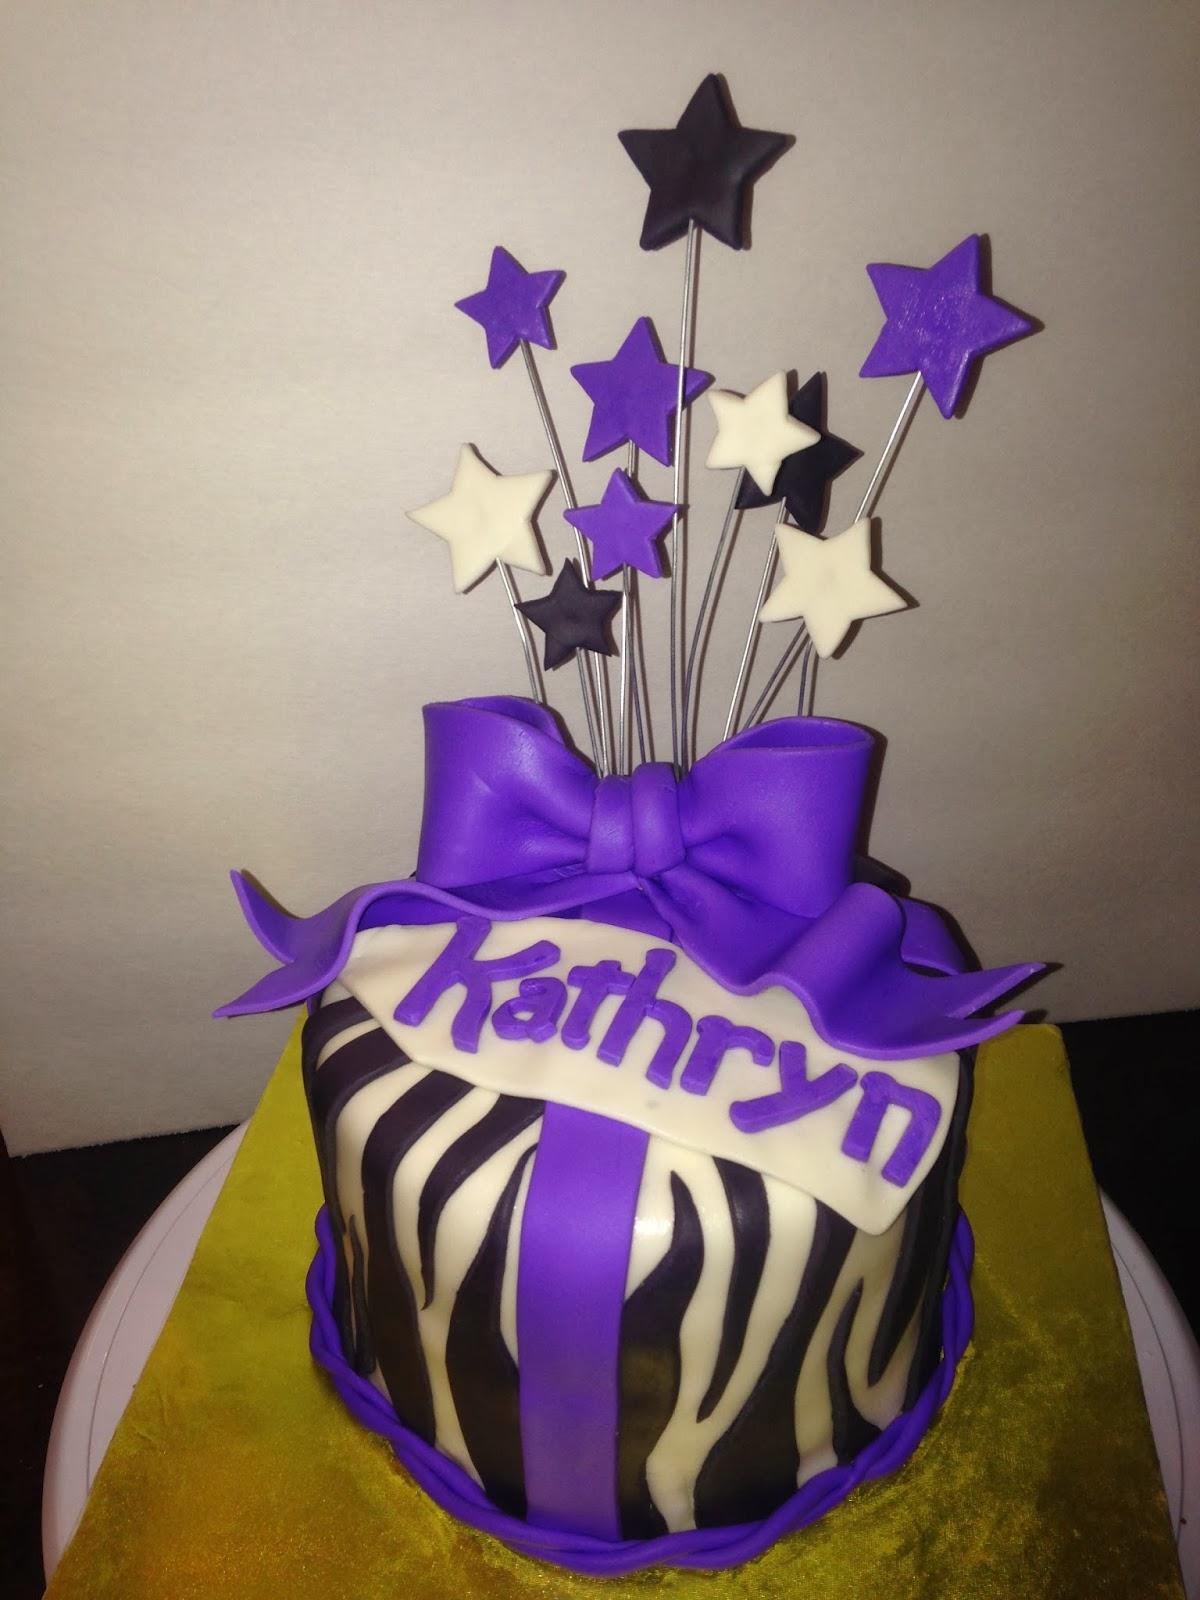 Joyce Gourmet Zebra Birthday Cake With A Lavender Ribbon